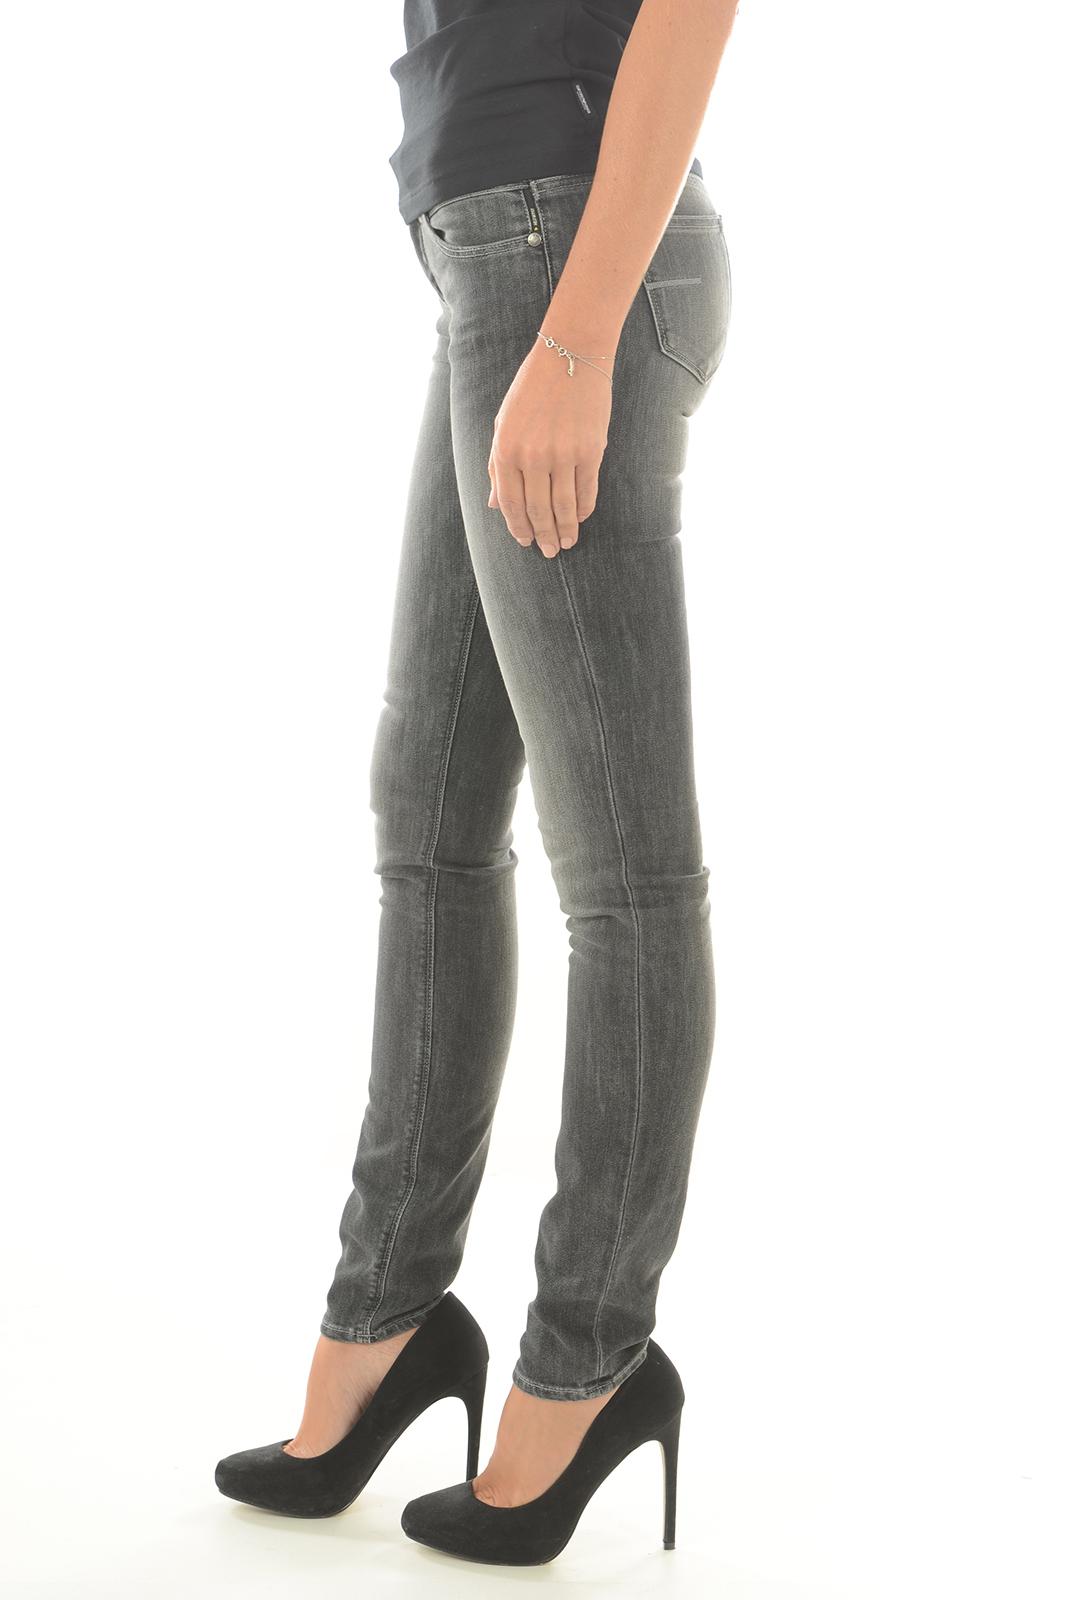 Jeans   Meltin'pot MARCELINE/W D1515 USK41 GF14  GRIS